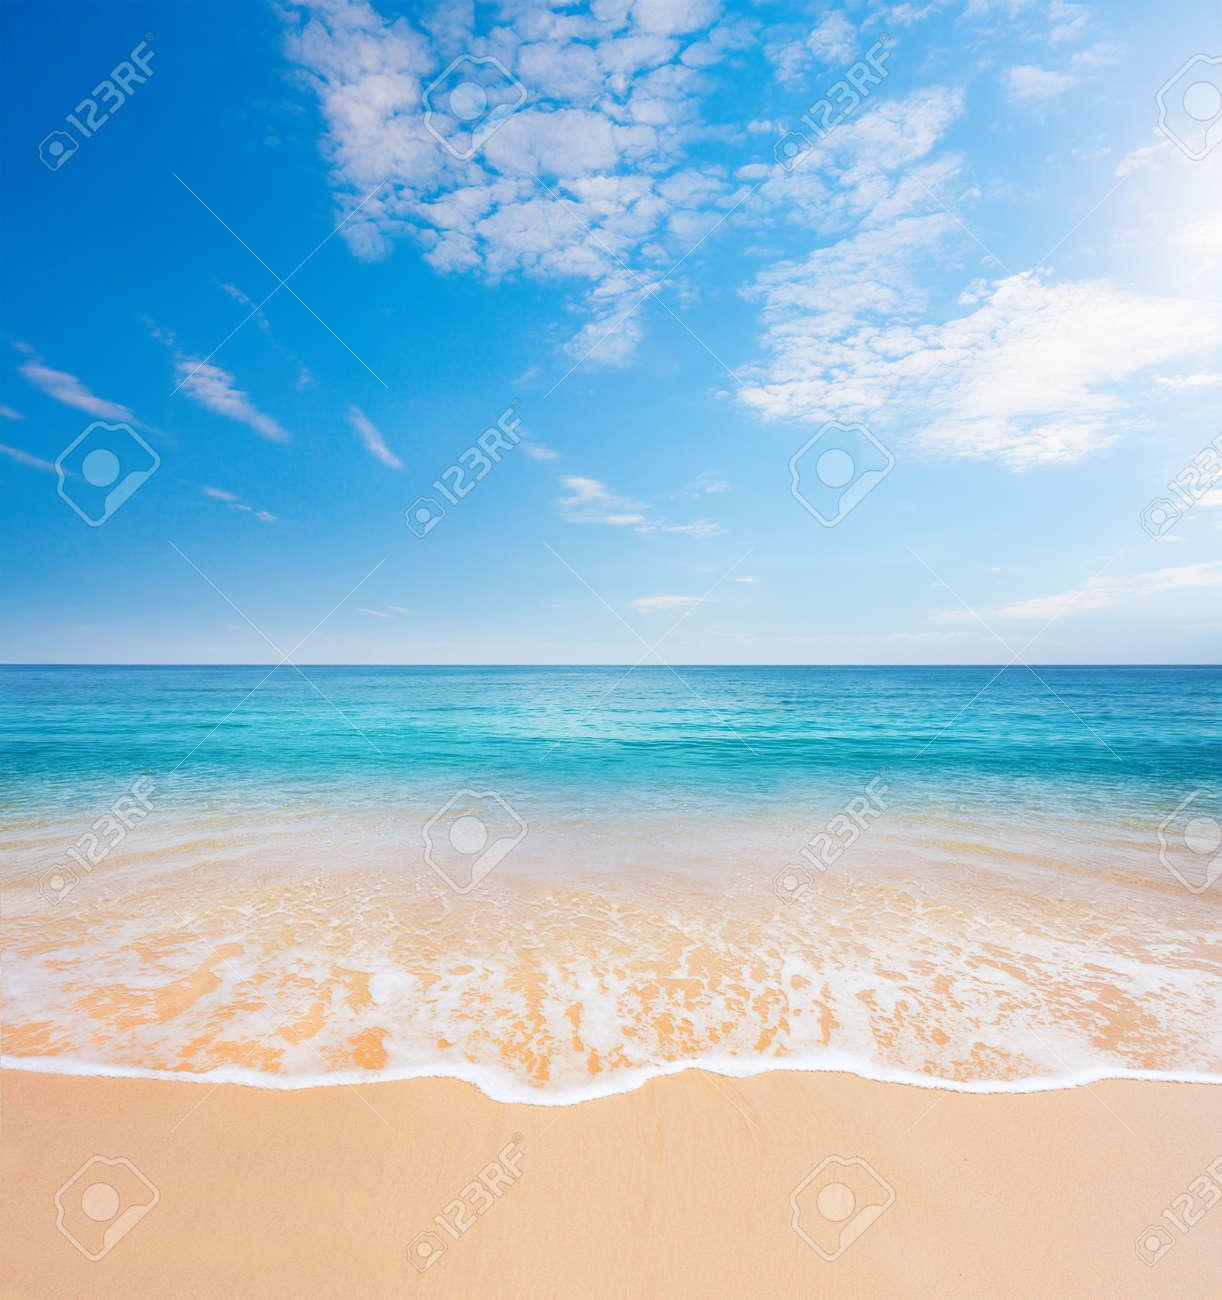 beach and tropical sea - 34824487